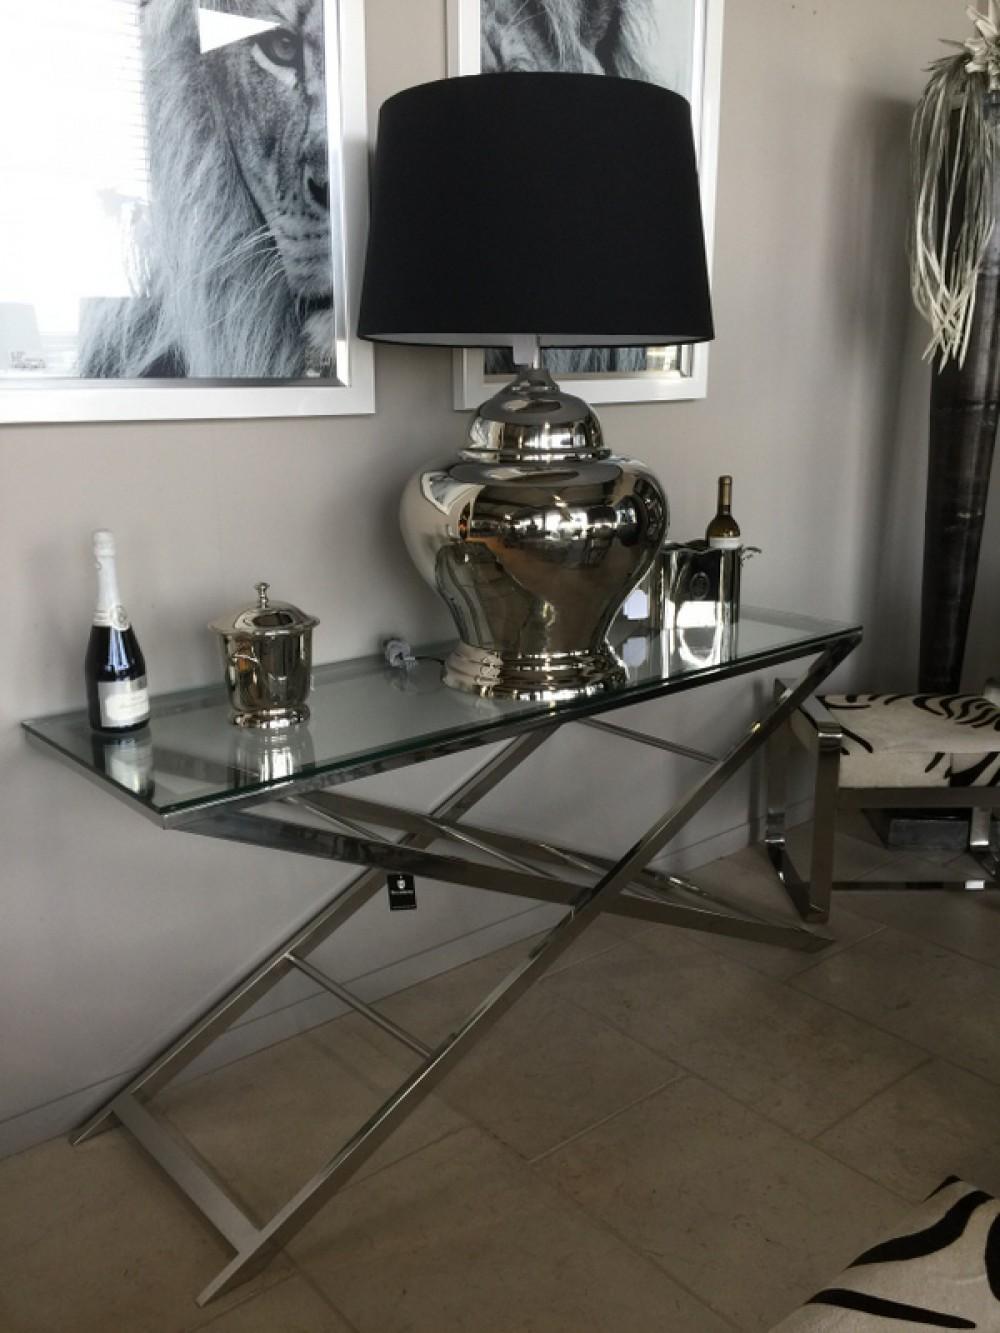 konsole verchromt glas metall sideboard mit glasplatte wandtisch verchromt glas ma e 160x50 cm. Black Bedroom Furniture Sets. Home Design Ideas